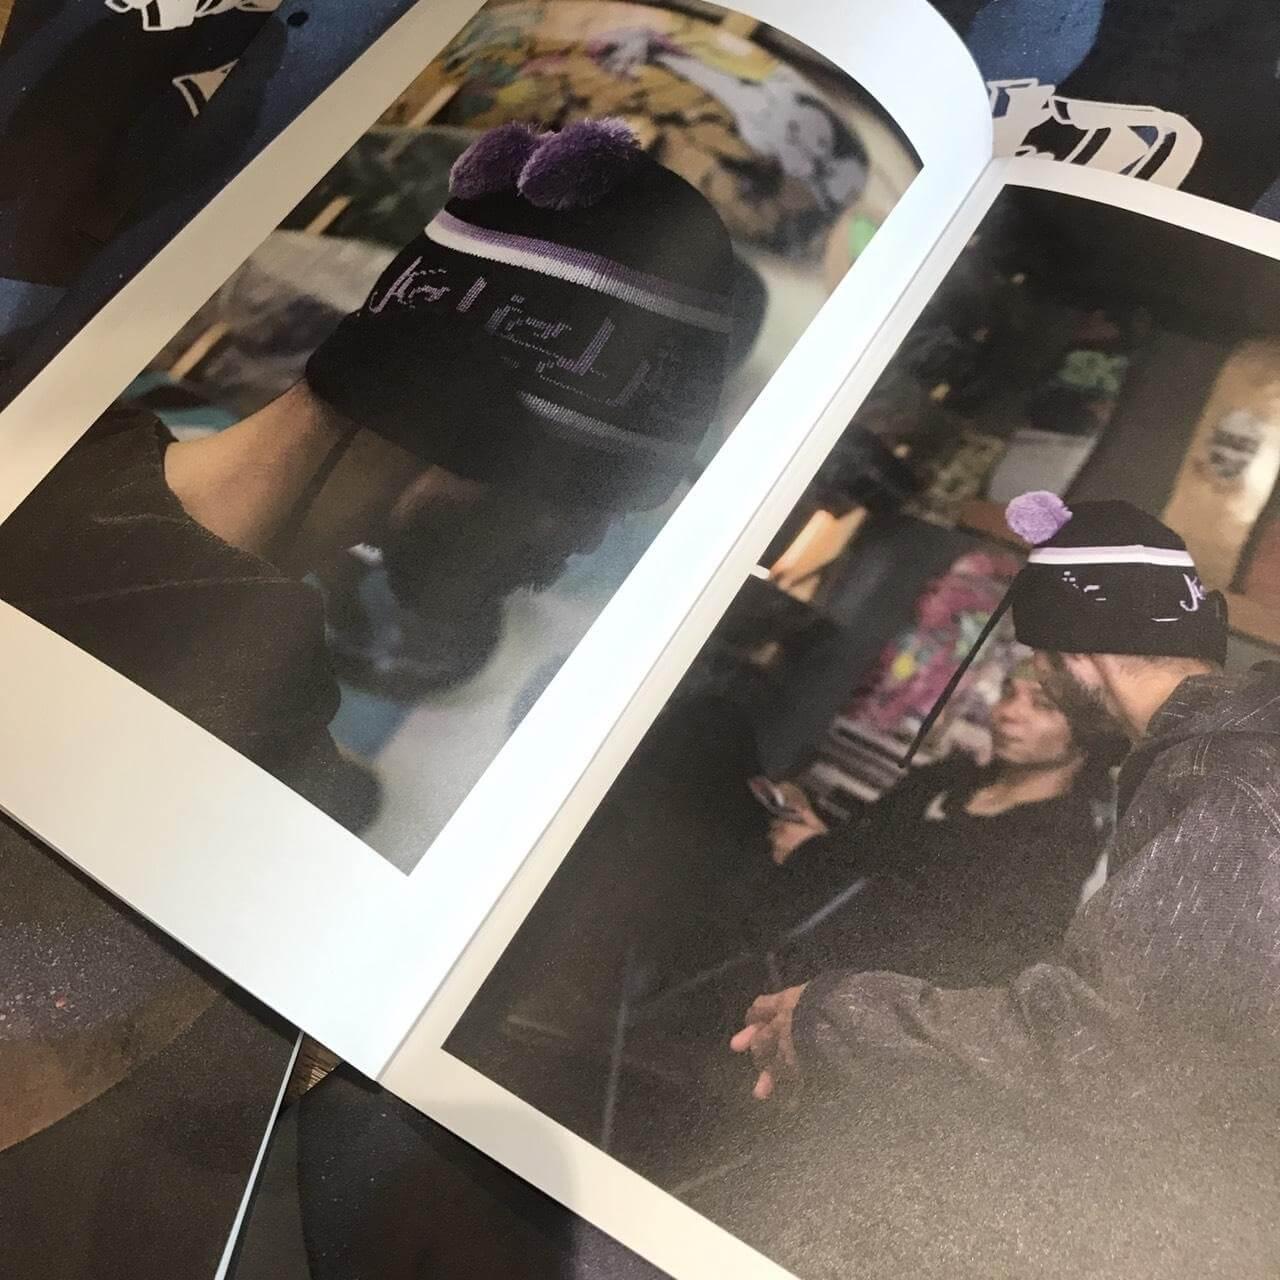 MEN YARD FIGHTなどでポップアップを行う「KIRIME」、次の展示は東急プラザ銀座にて life-fashion210424-kirime-7